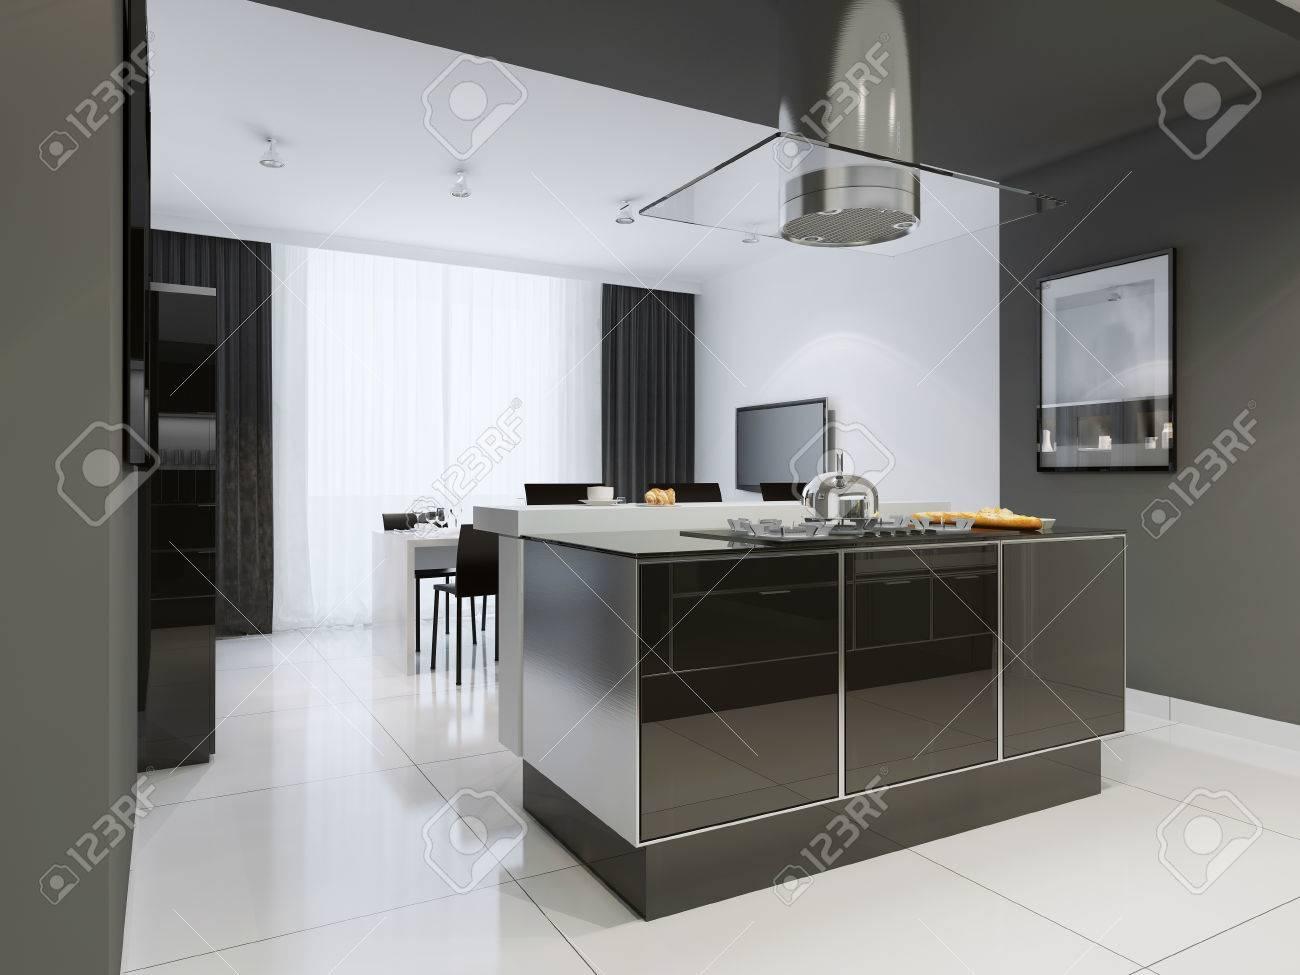 stile moderno cucina. cucina e sala da pranzo con pareti in ... - Mobili Moderni Da Sala